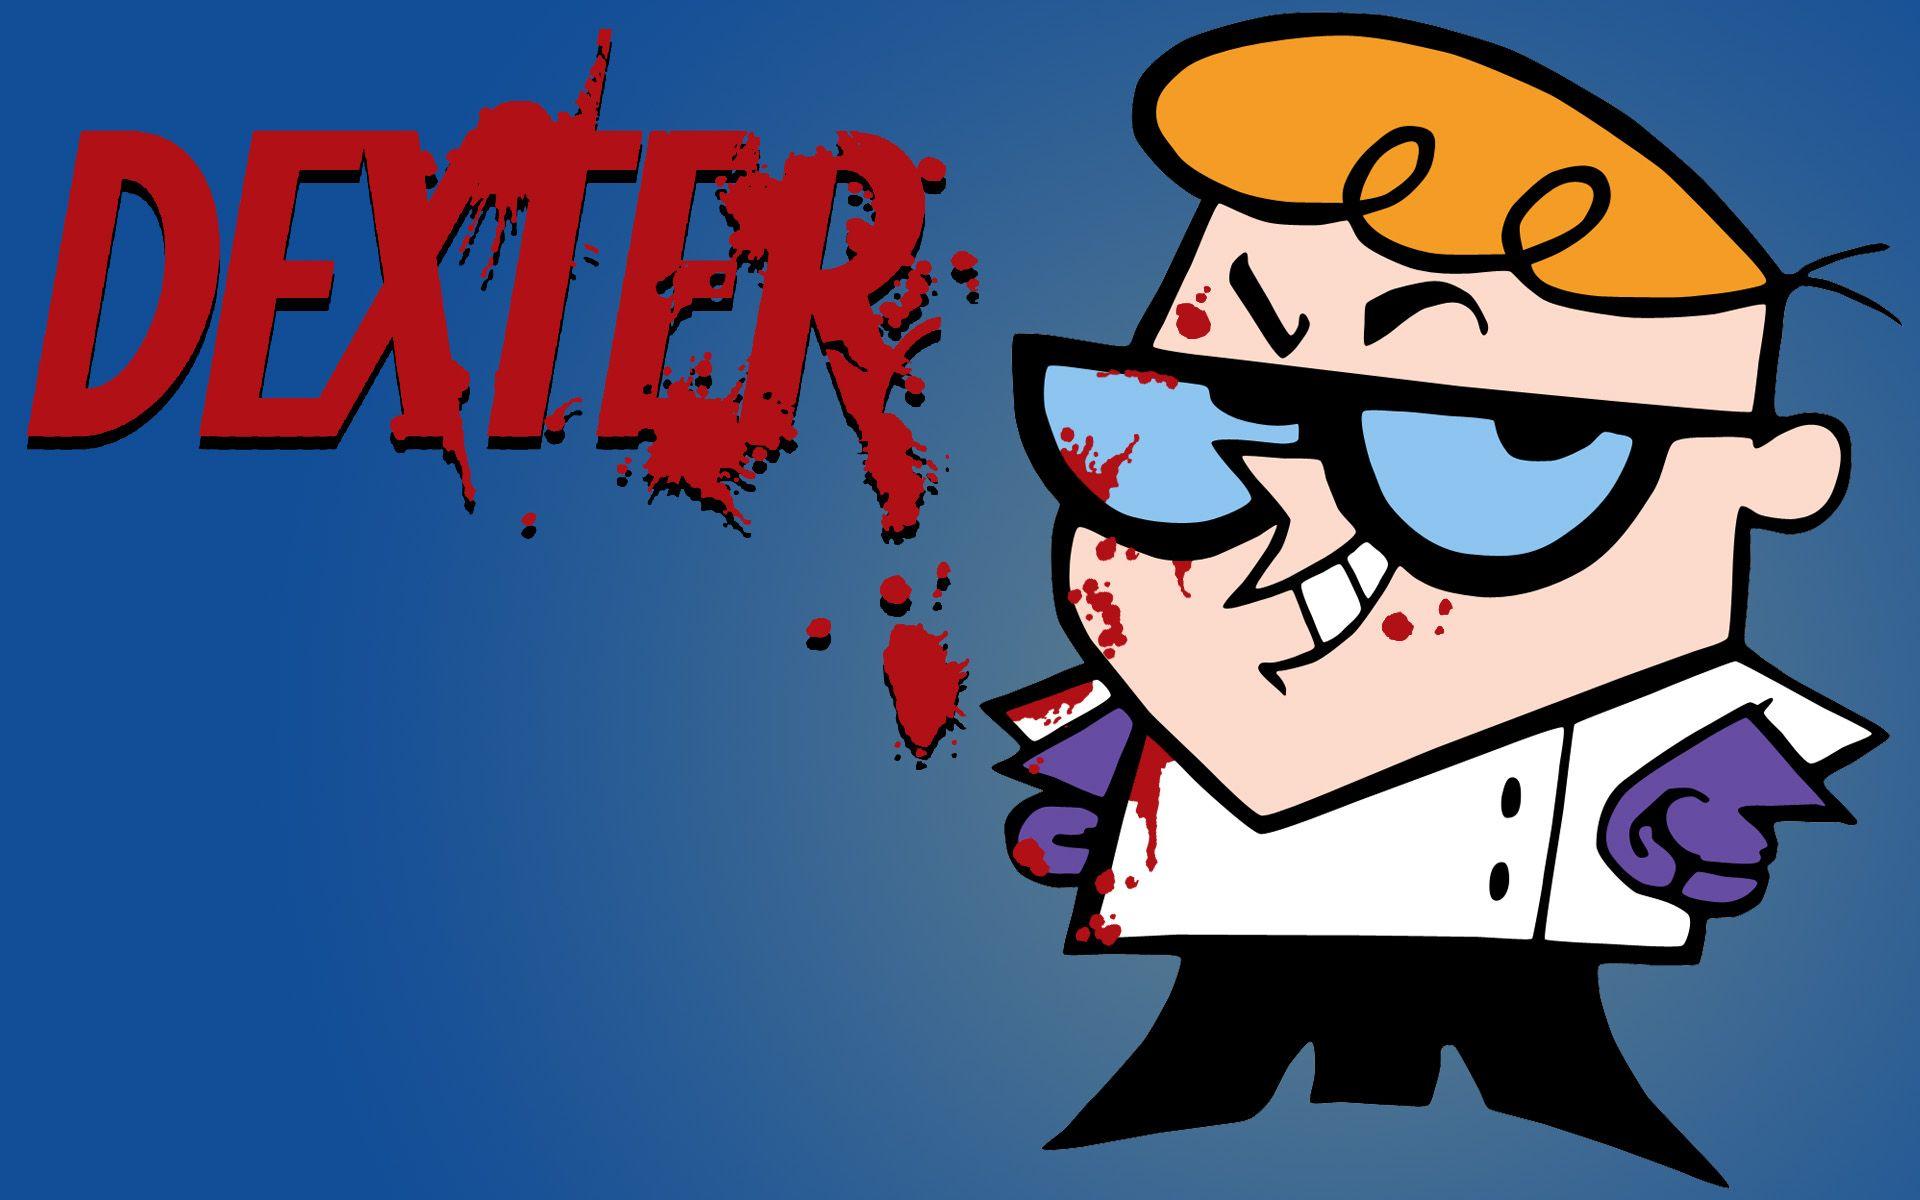 Dexters Lab Cartoon Network Characters Dexter Cartoon Cartoon Wallpaper